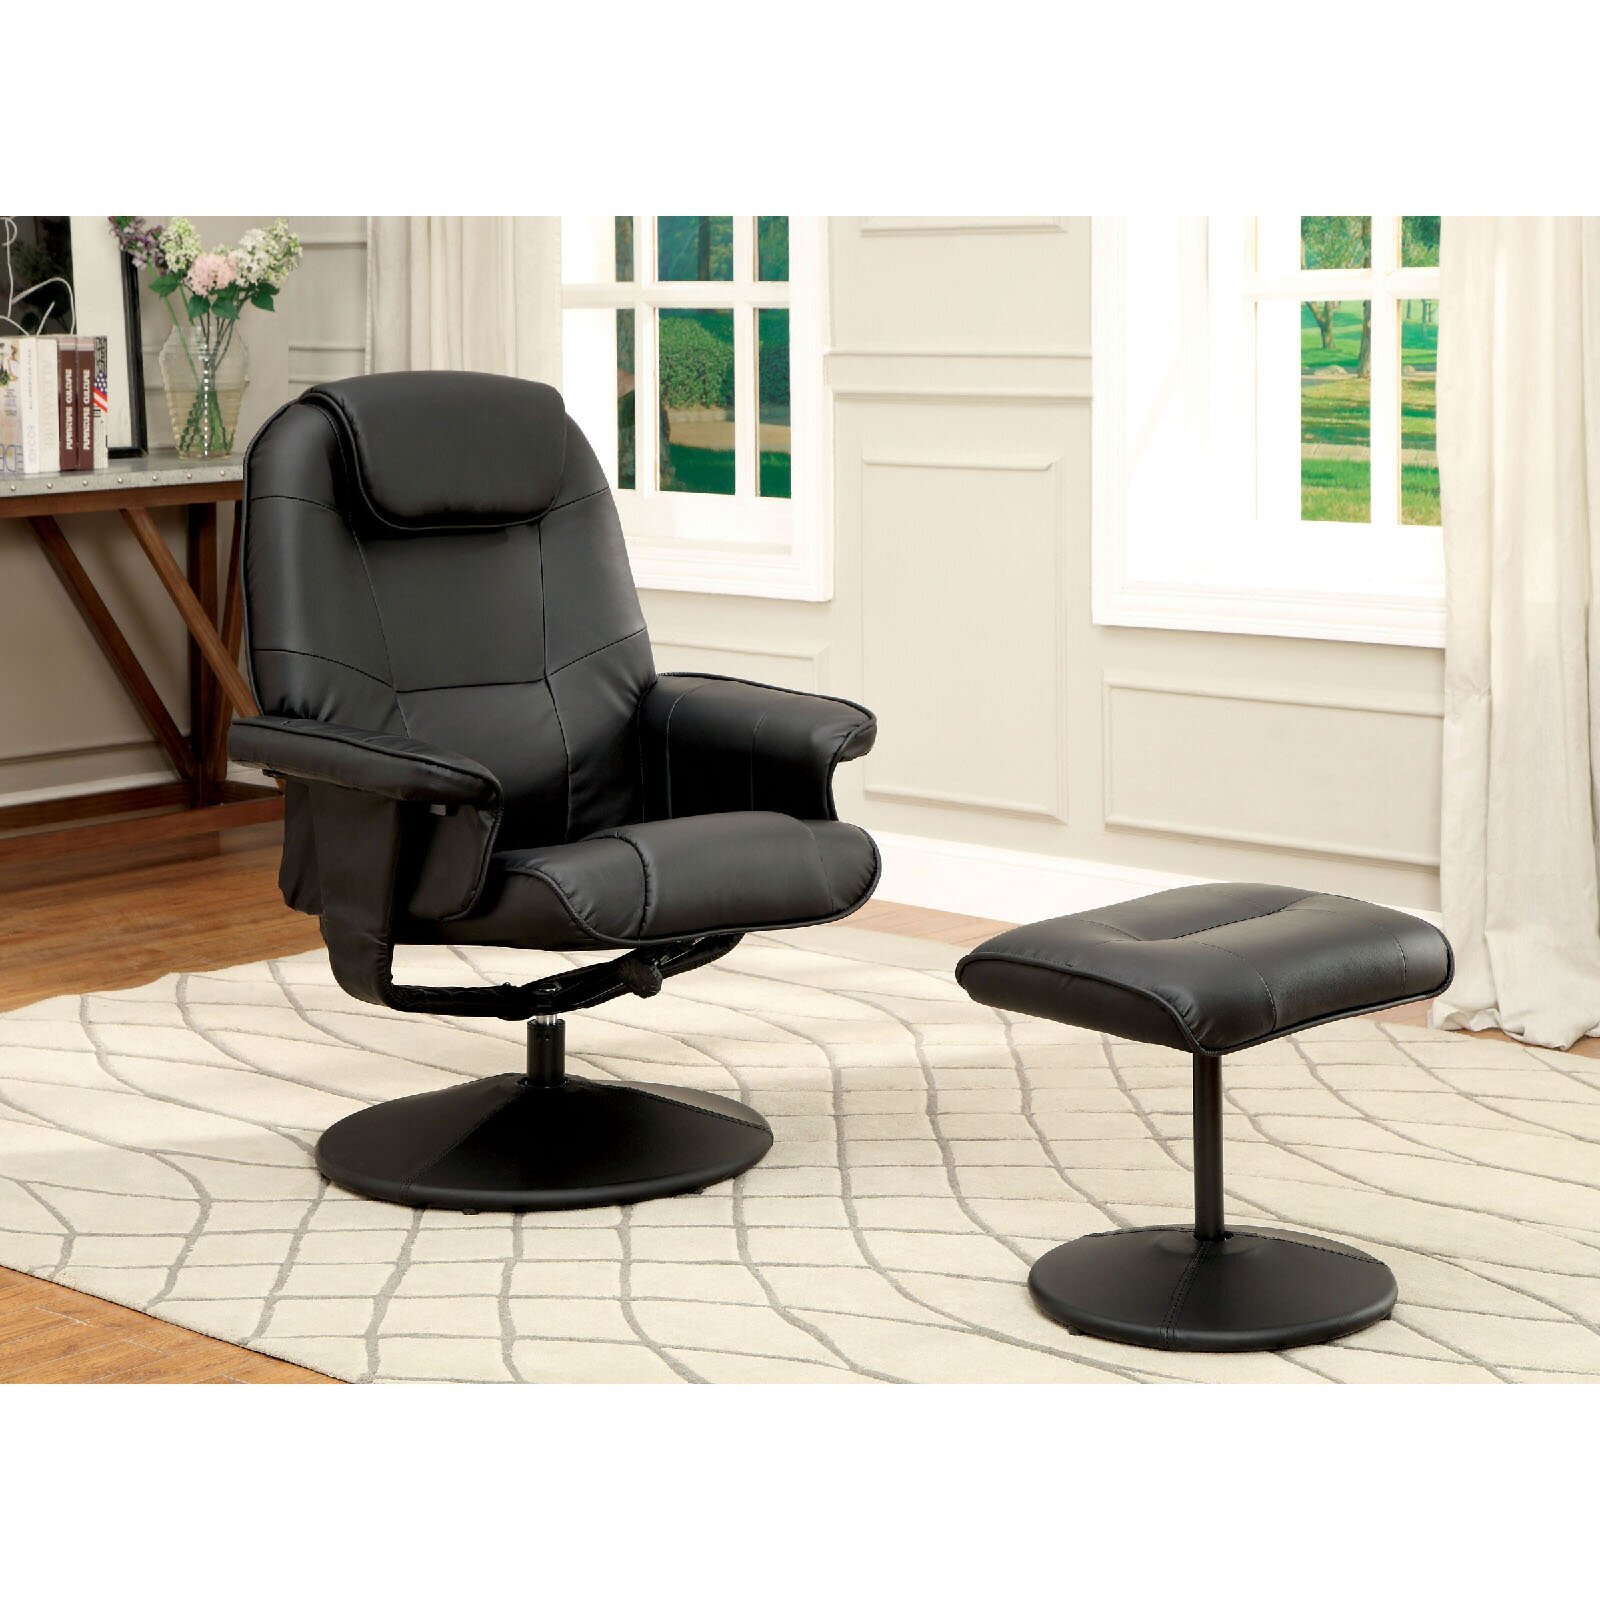 Stanley Kids Bedroom Furniture A Amp J Homes Studio Stanley Upholstered Swivel Recliner And